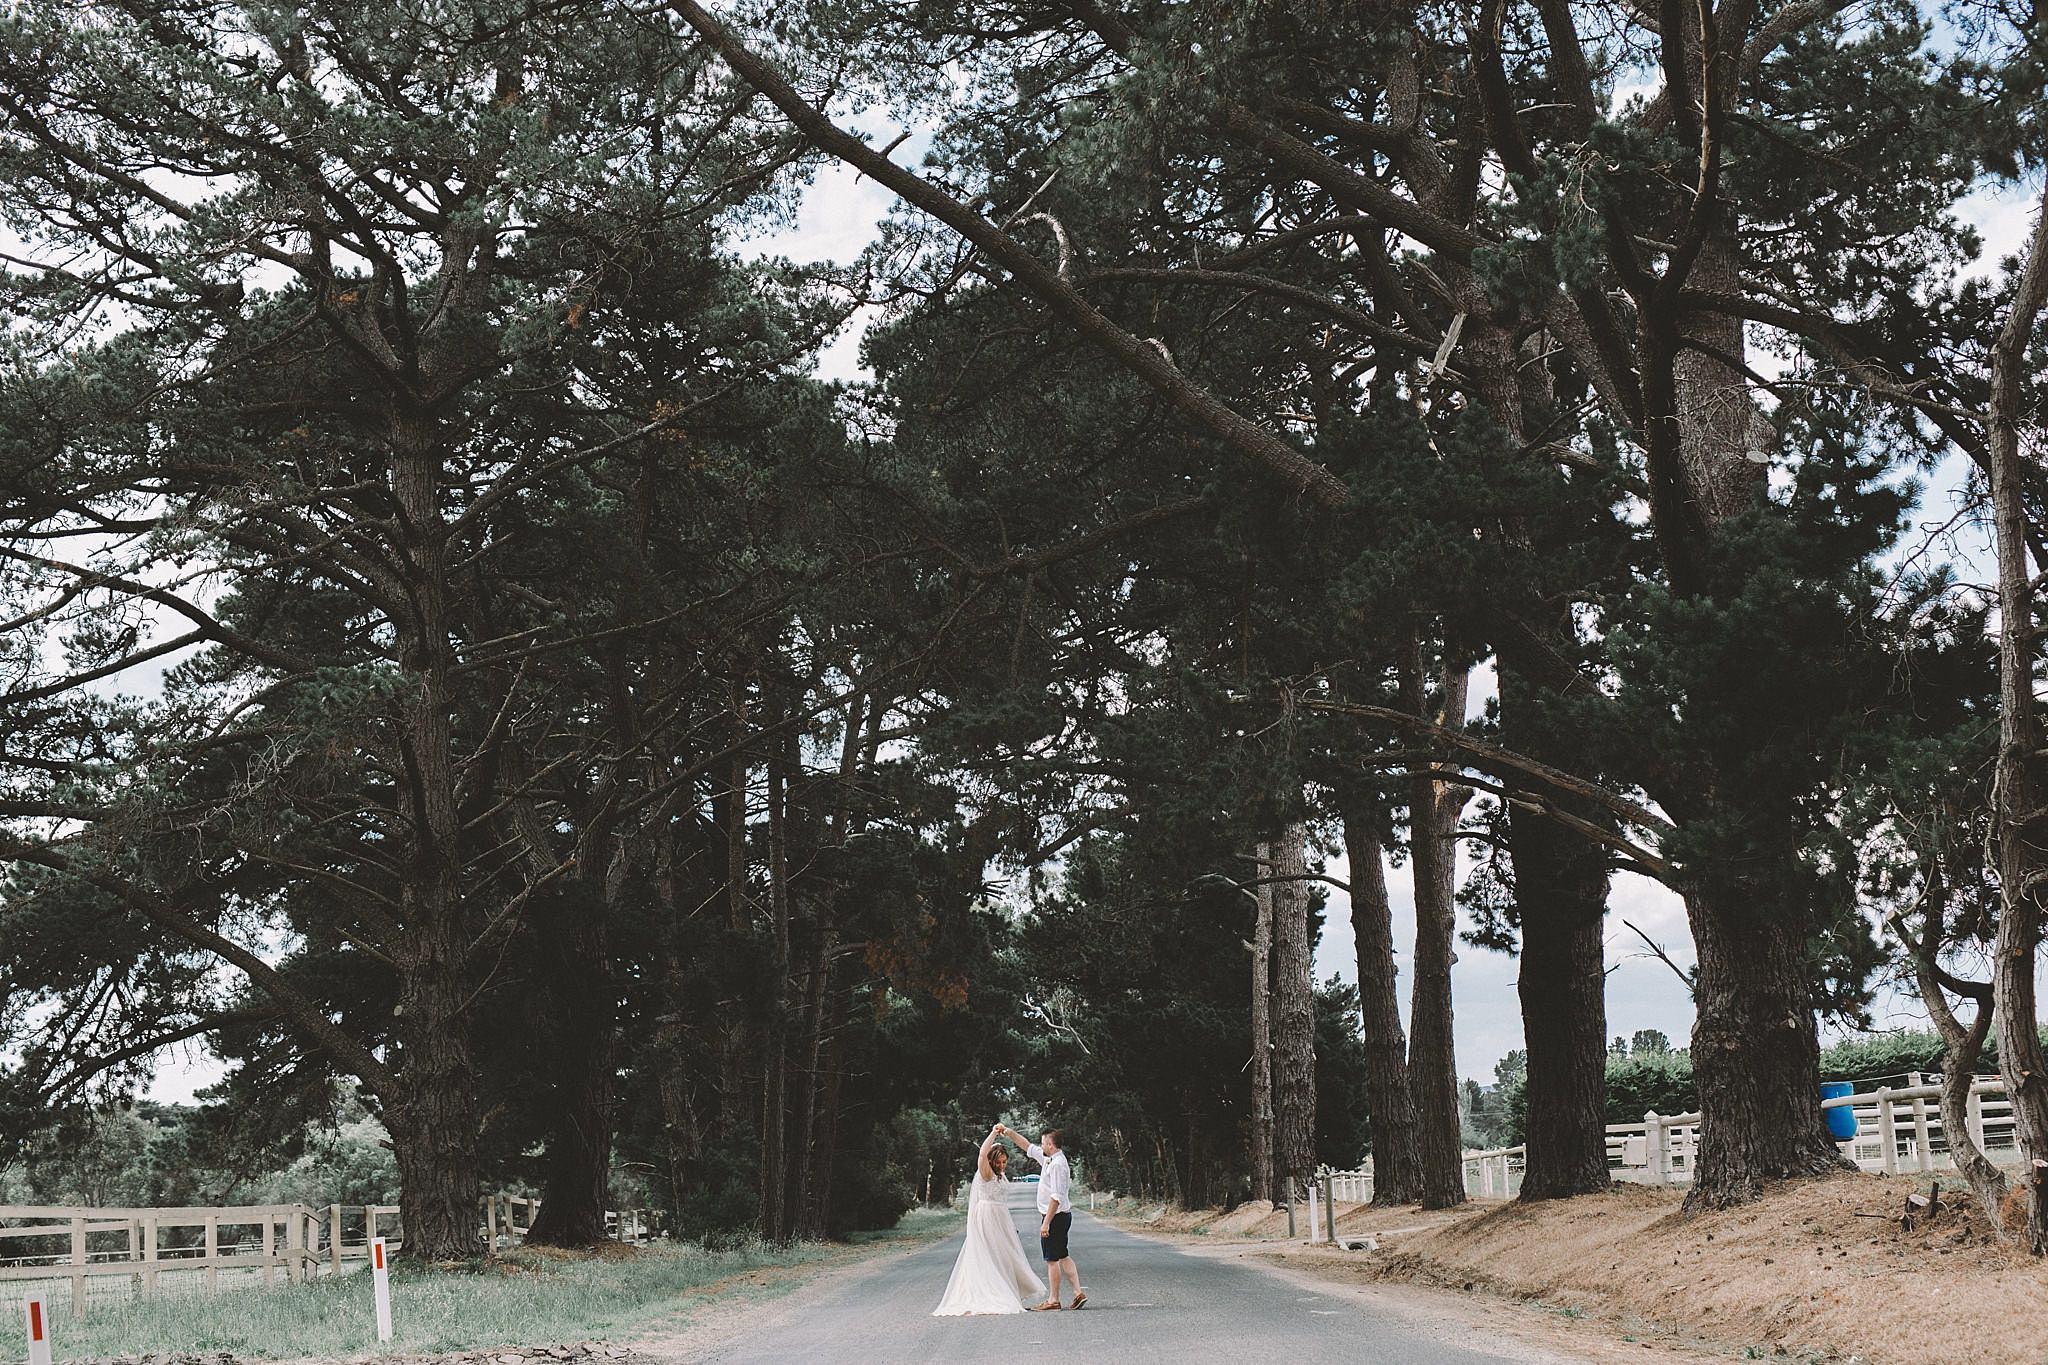 Mornington Peninsula Wedding Photographer 124.JPG